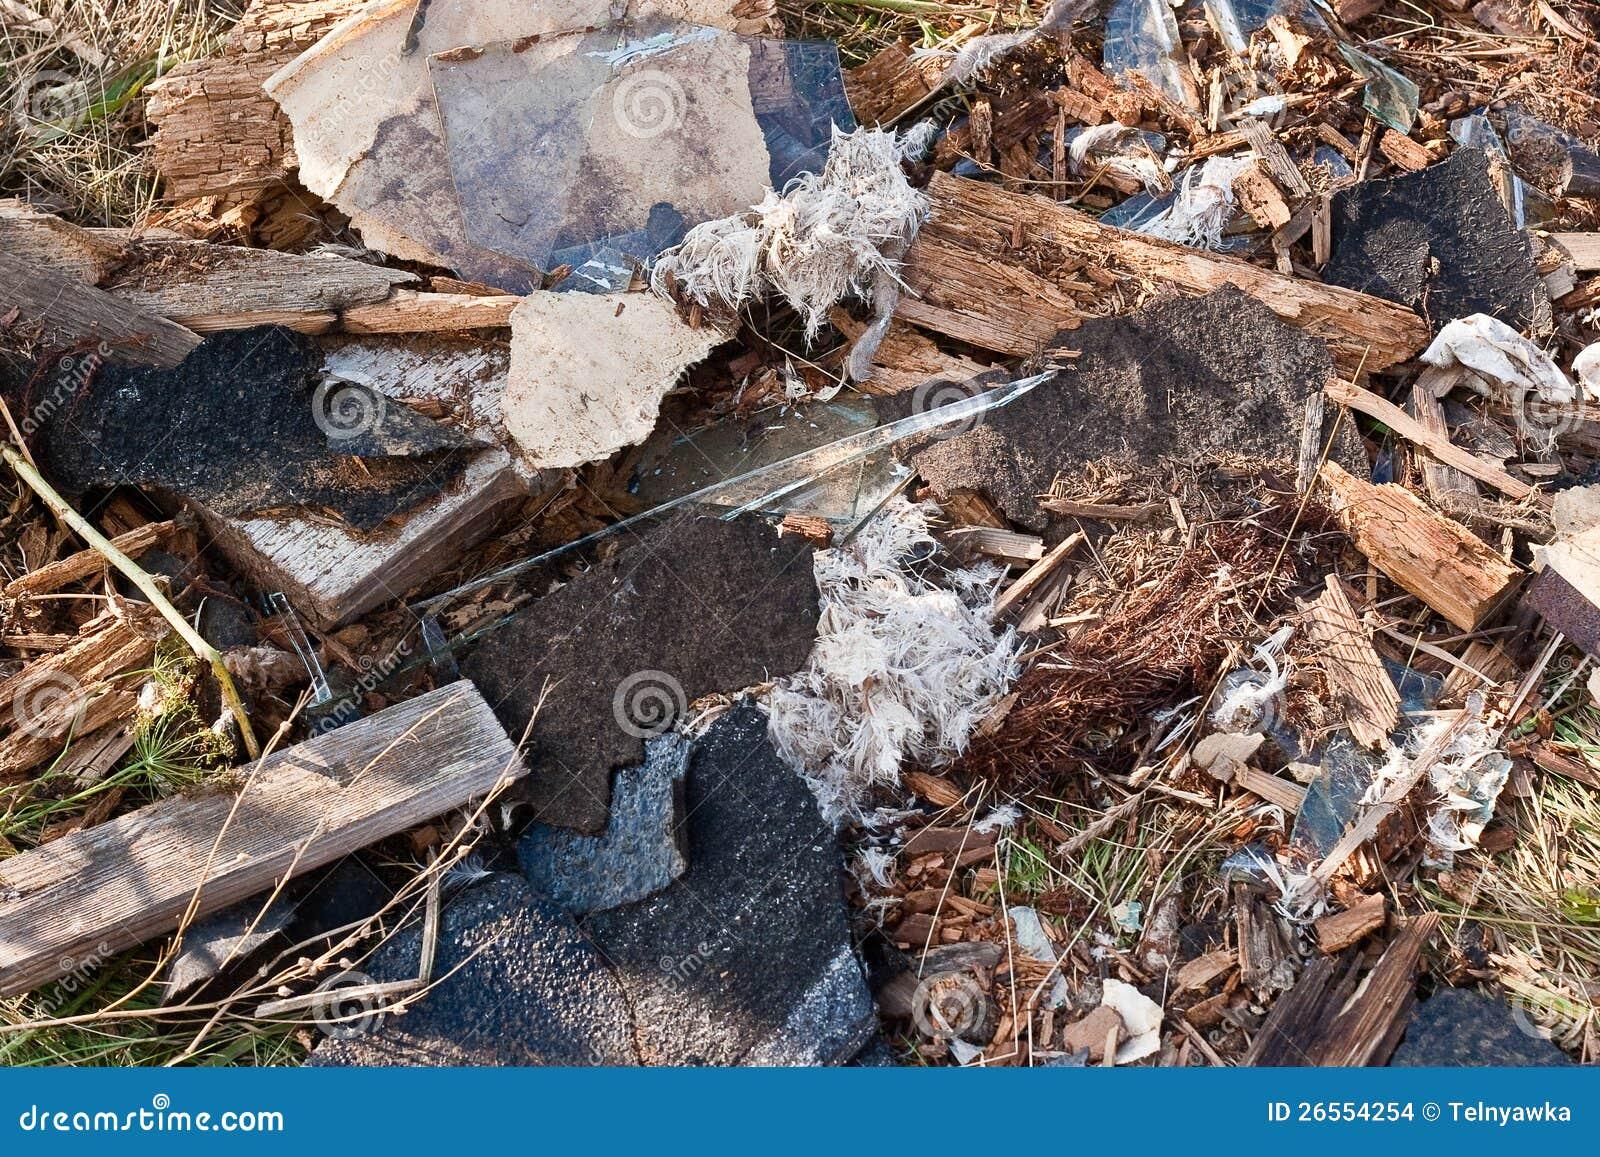 Pile Of Building Debris : A pile of debris stock images image